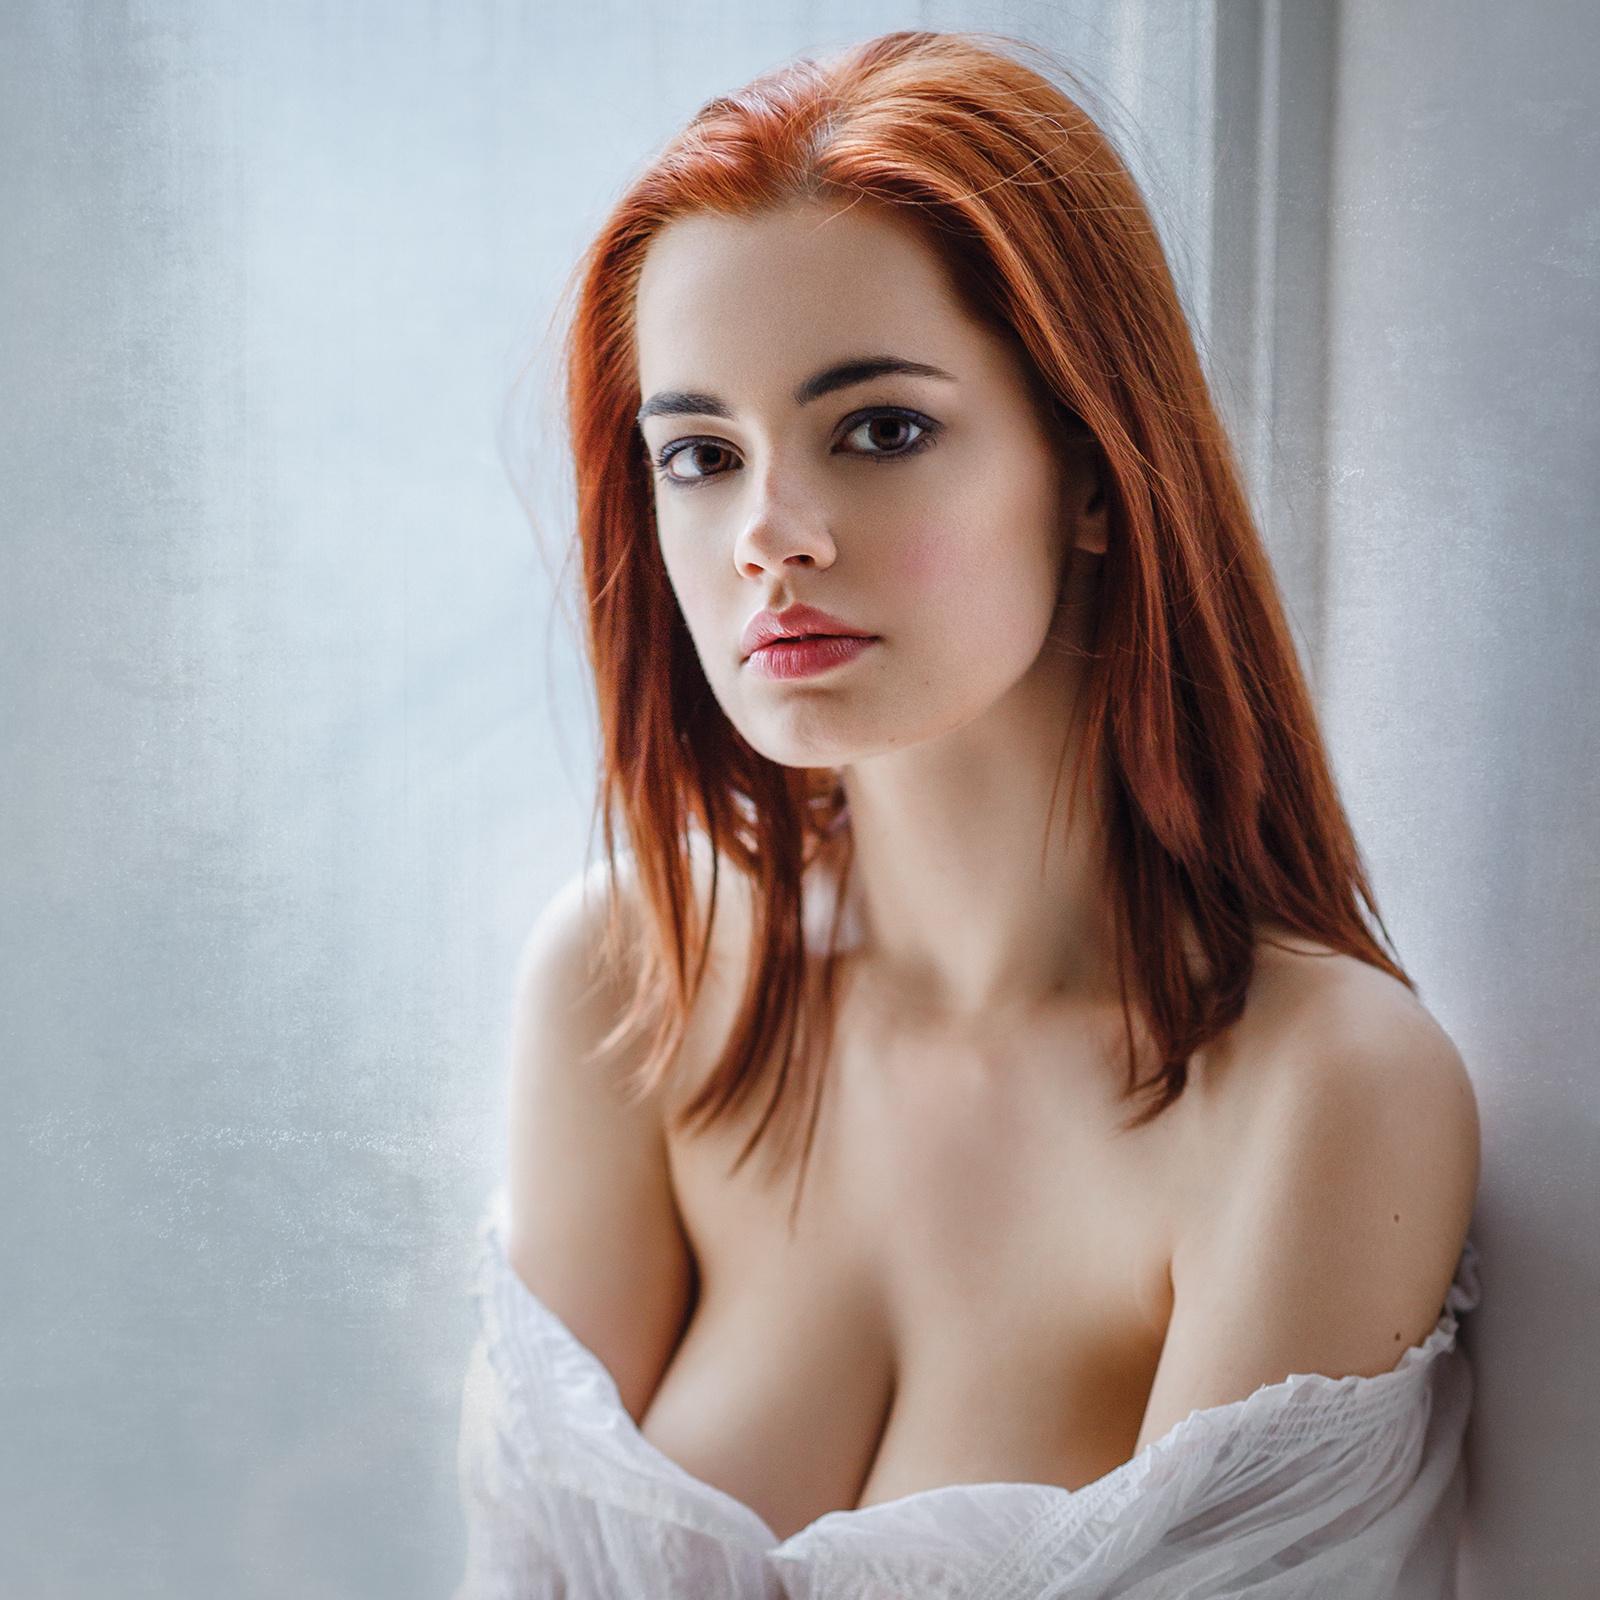 Fotos девушки голые супер